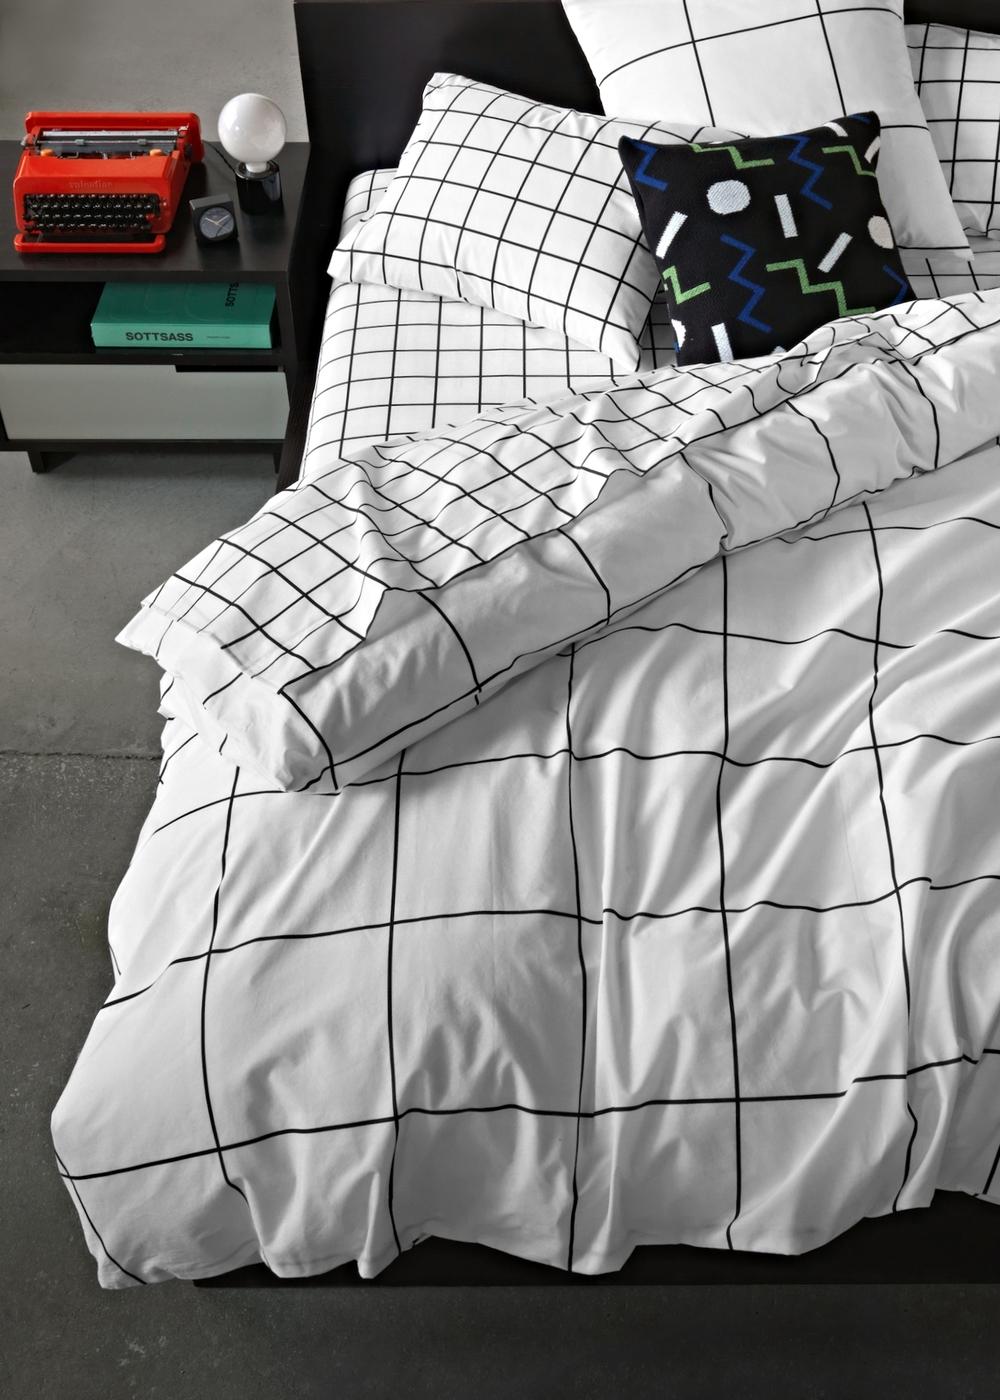 bedding_grid_overheadnew.jpg